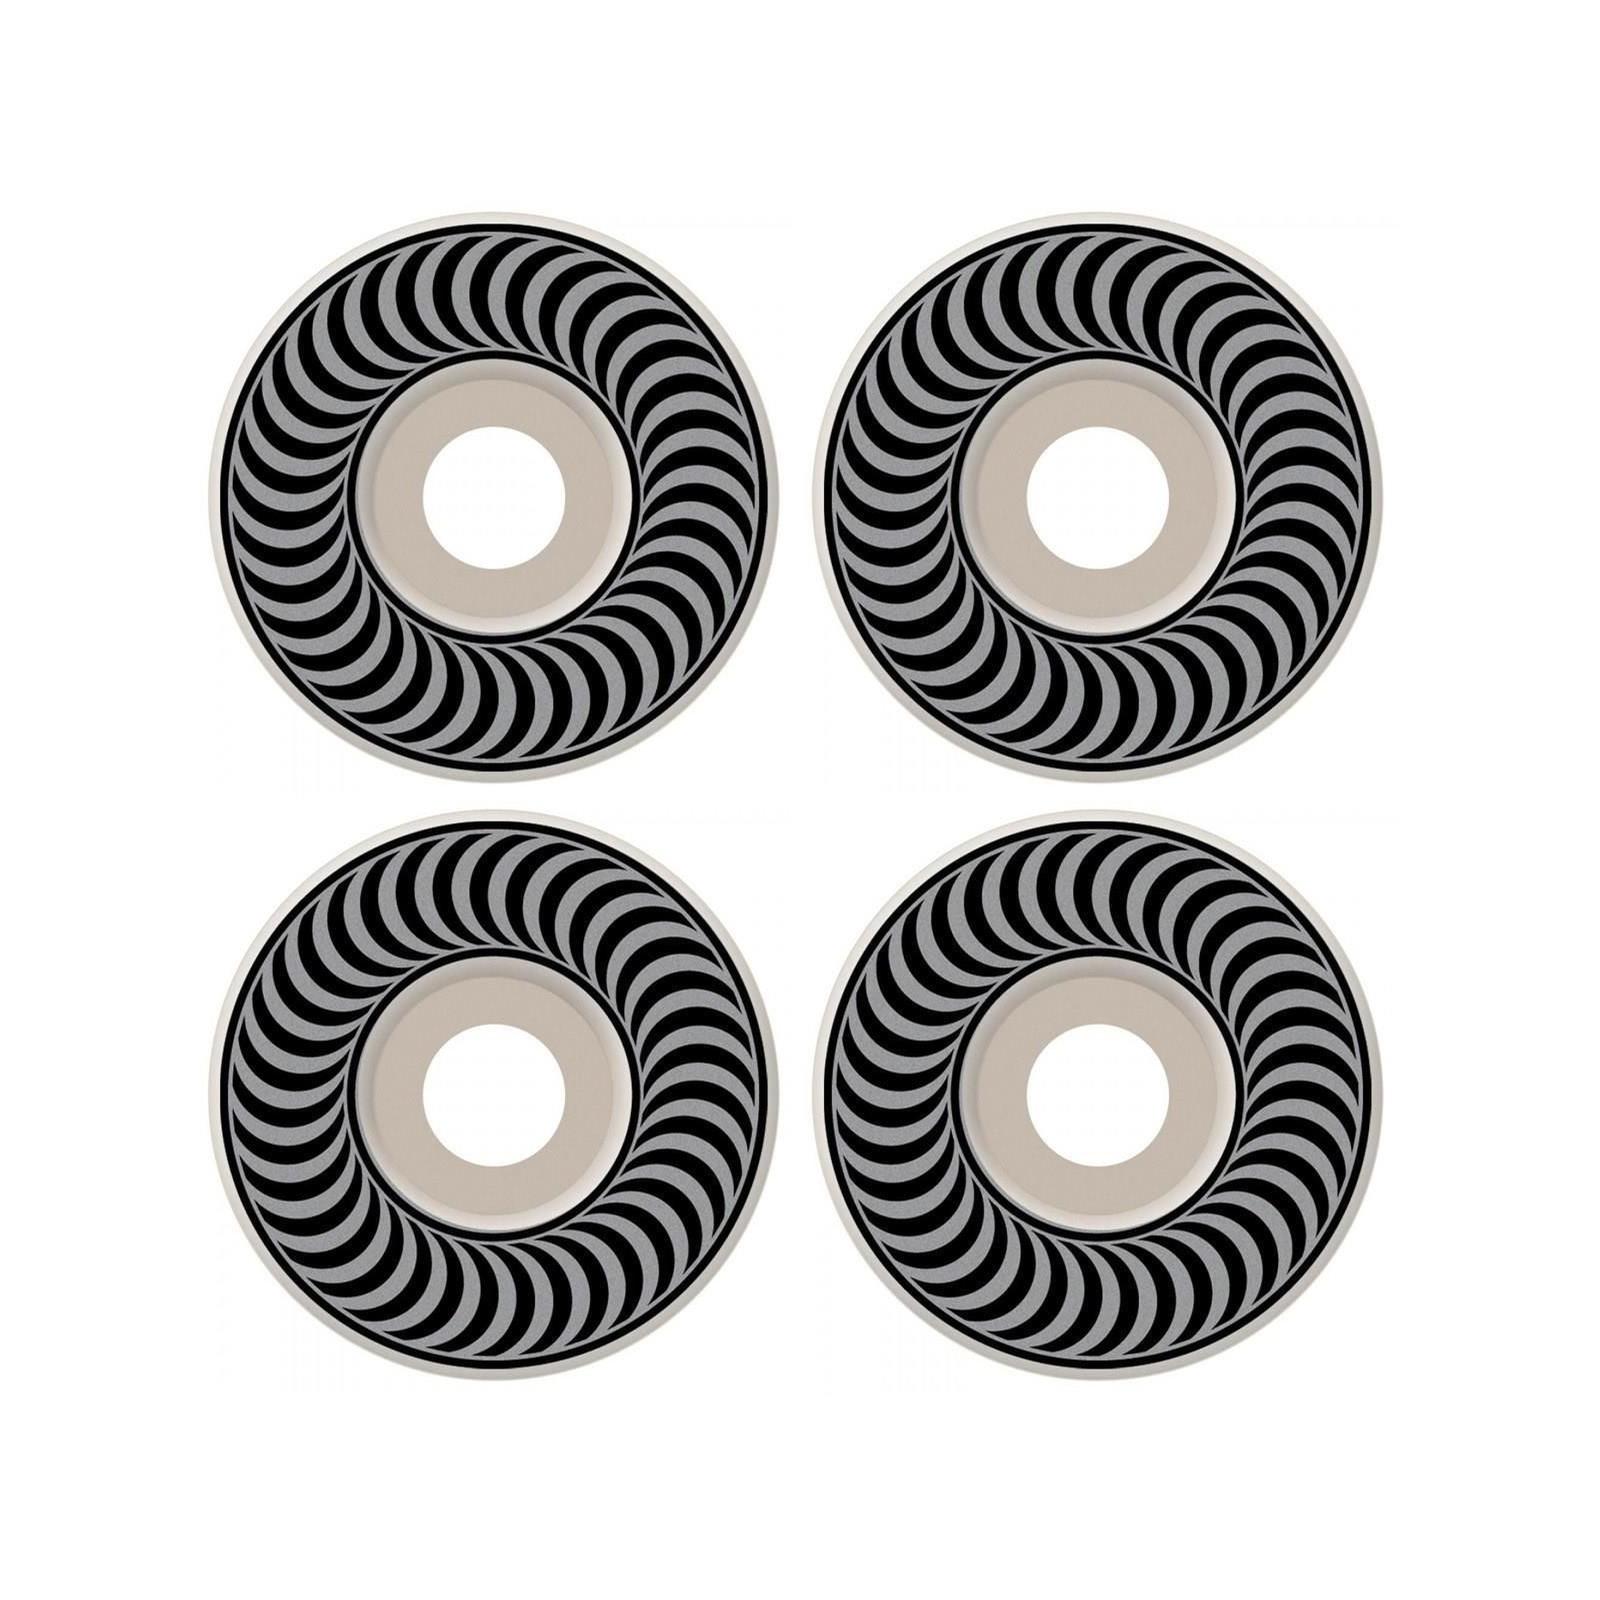 Wheels Classic 54mm (White/Black)